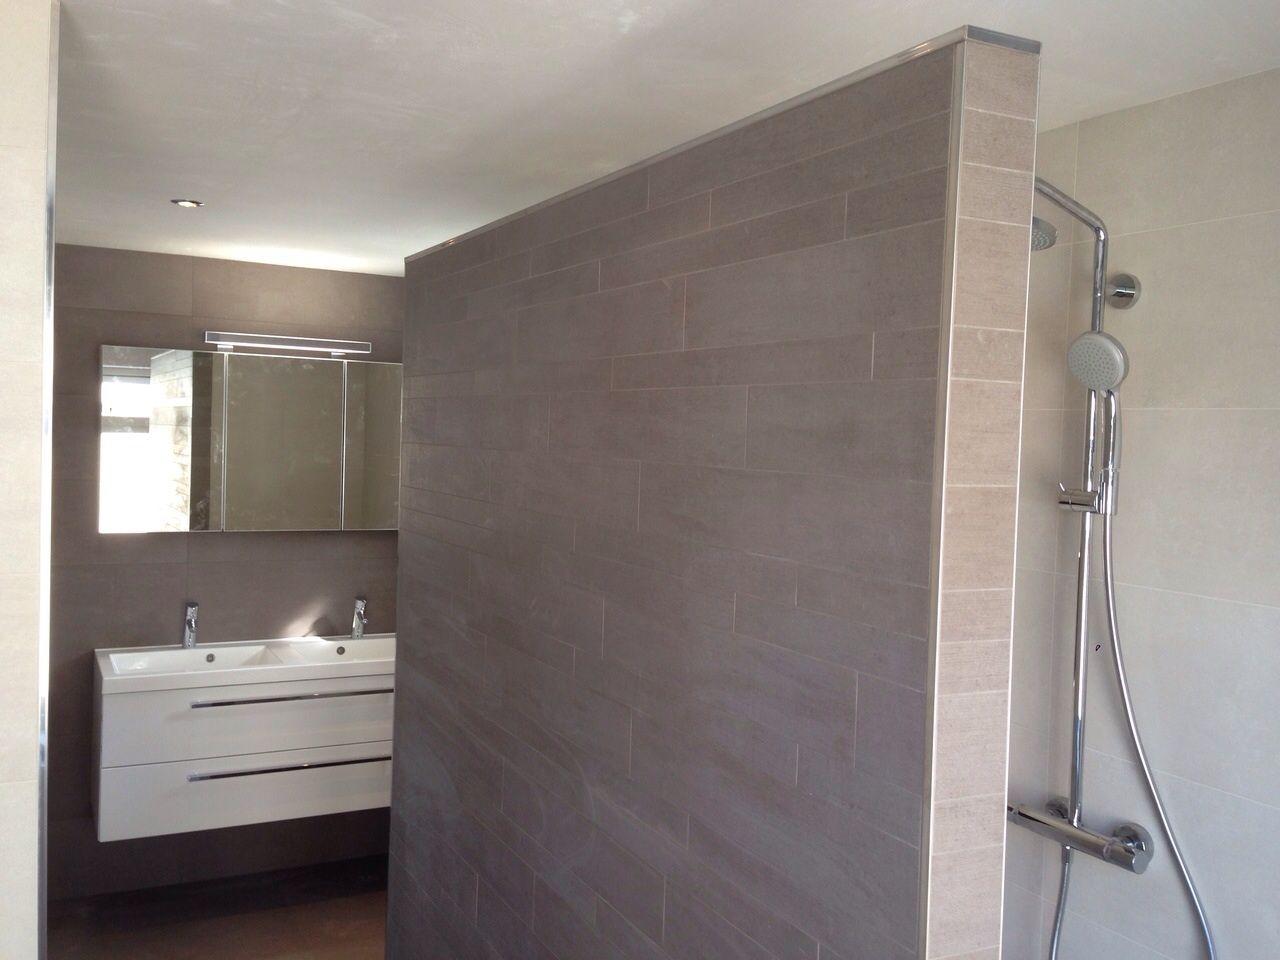 Wildverband Tegels Badkamer : Badkamer met wildverband tegels en stucplafond gerealiseerd door